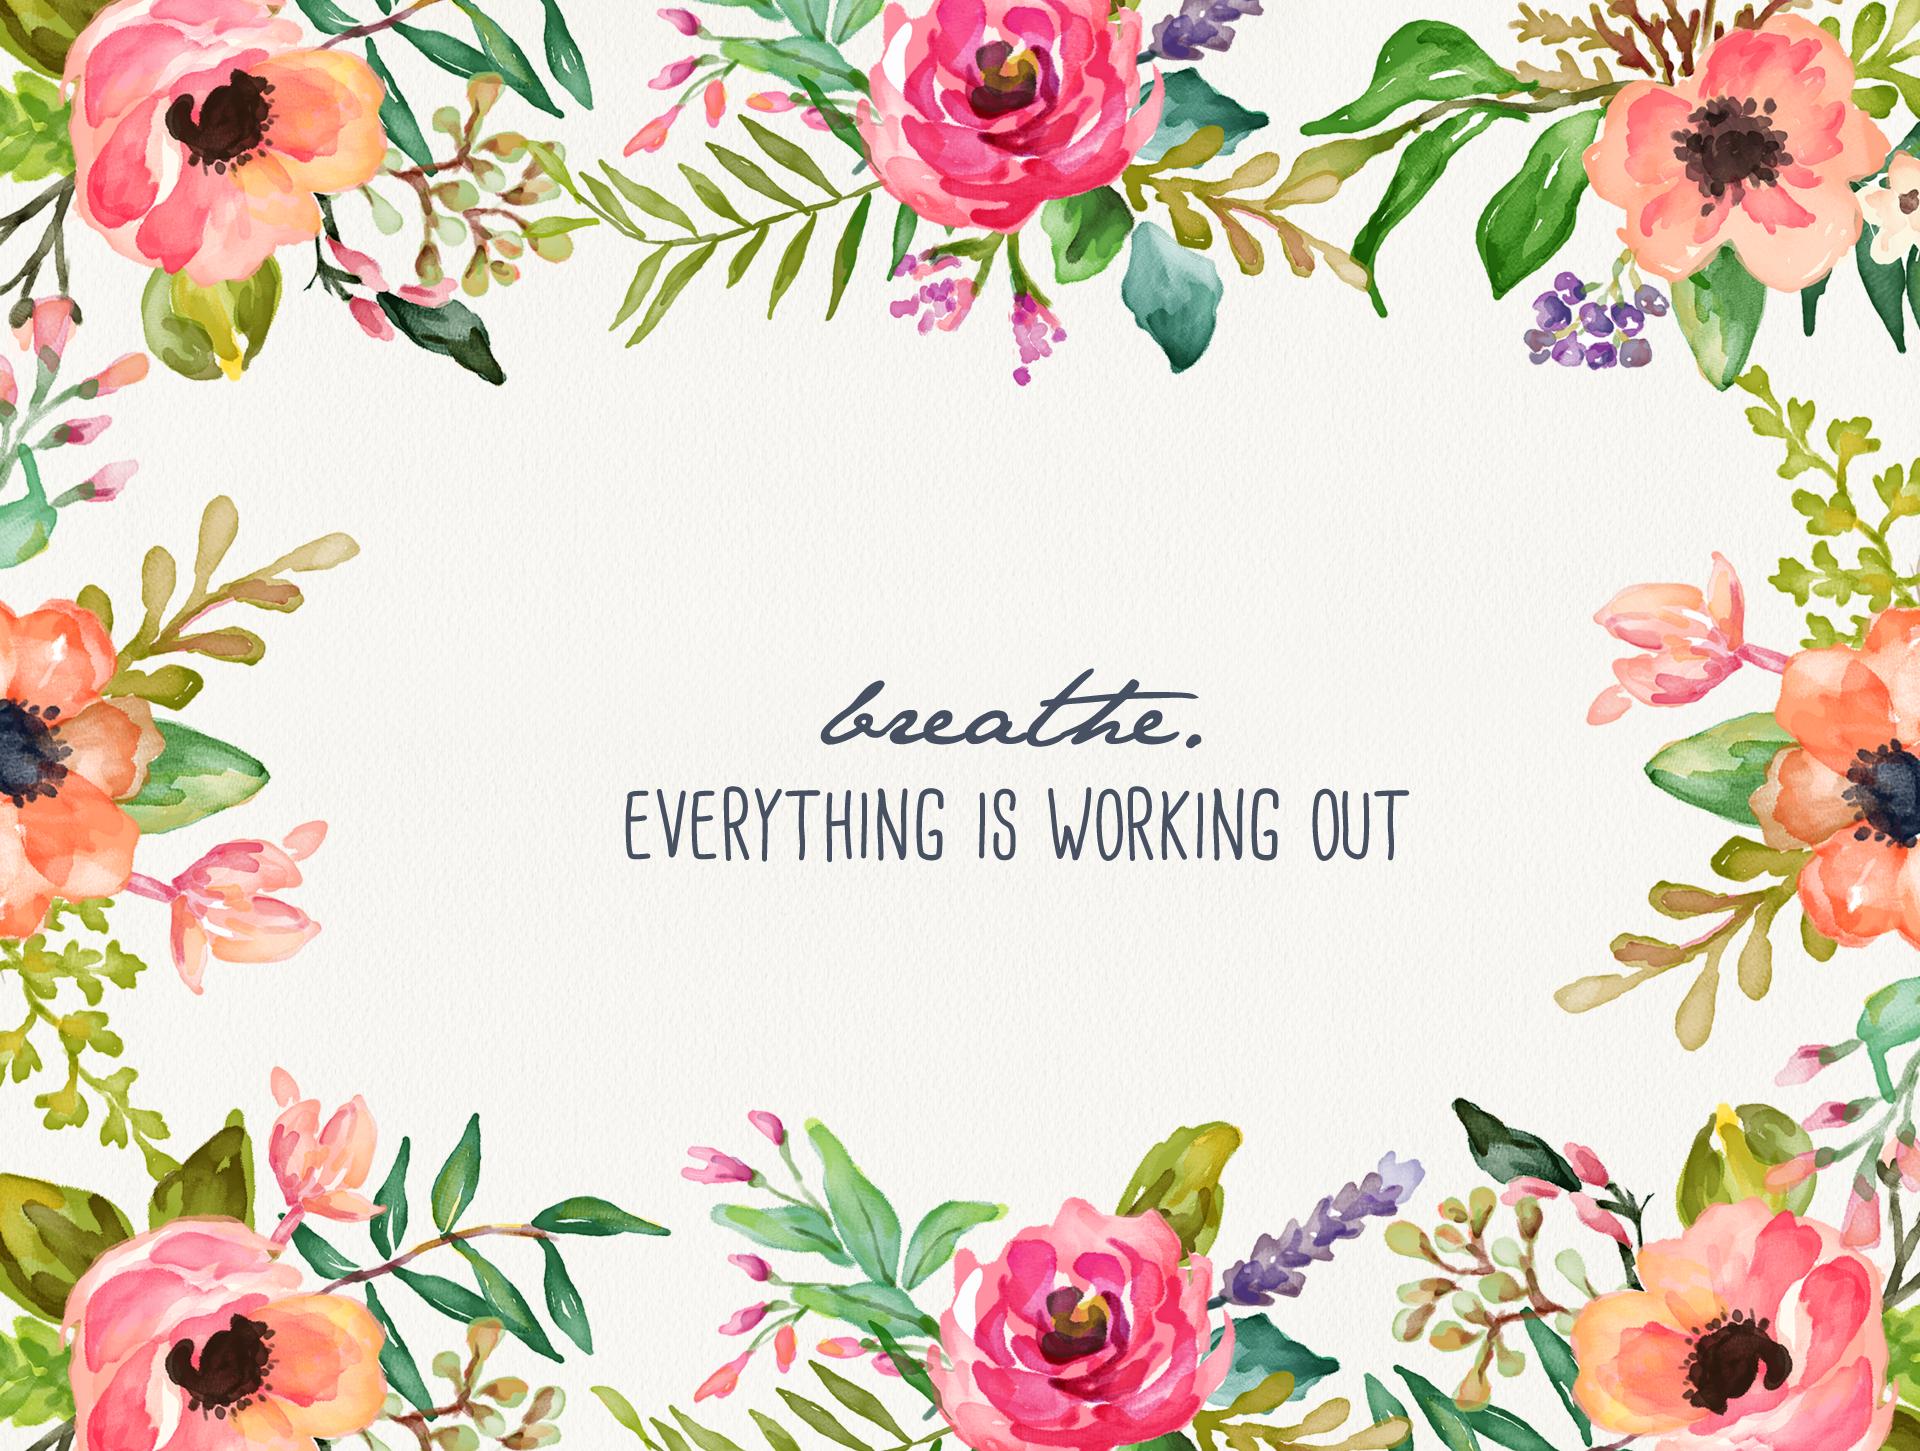 Free Download Breathe Floral Desktop Wallpaper Inspired By